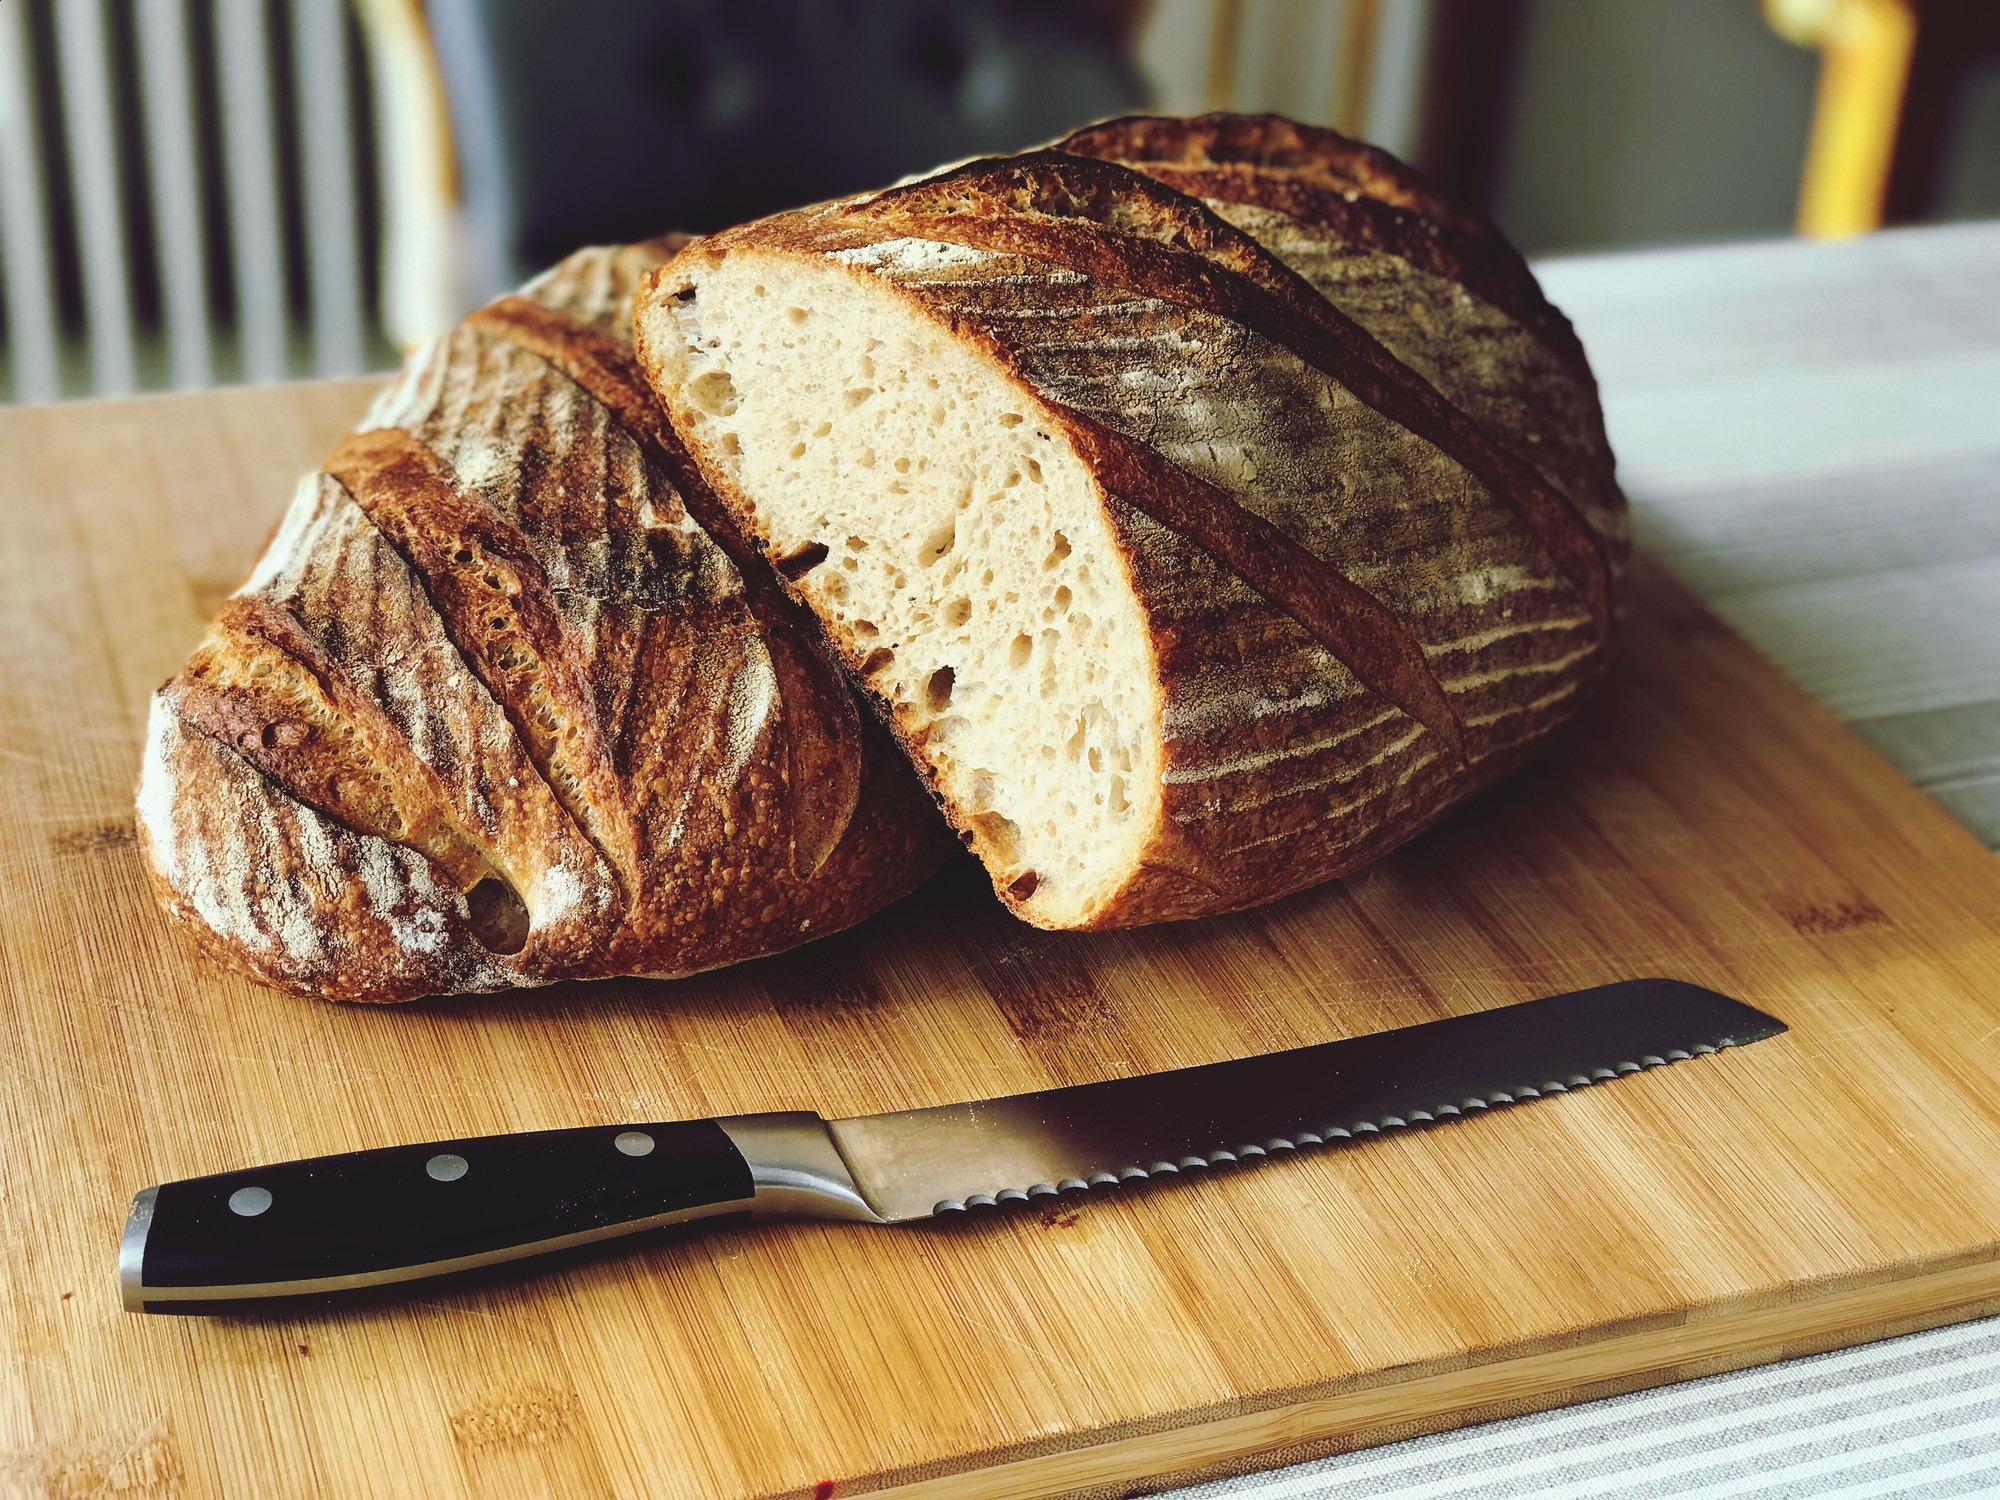 A loaf of sourdough bread.